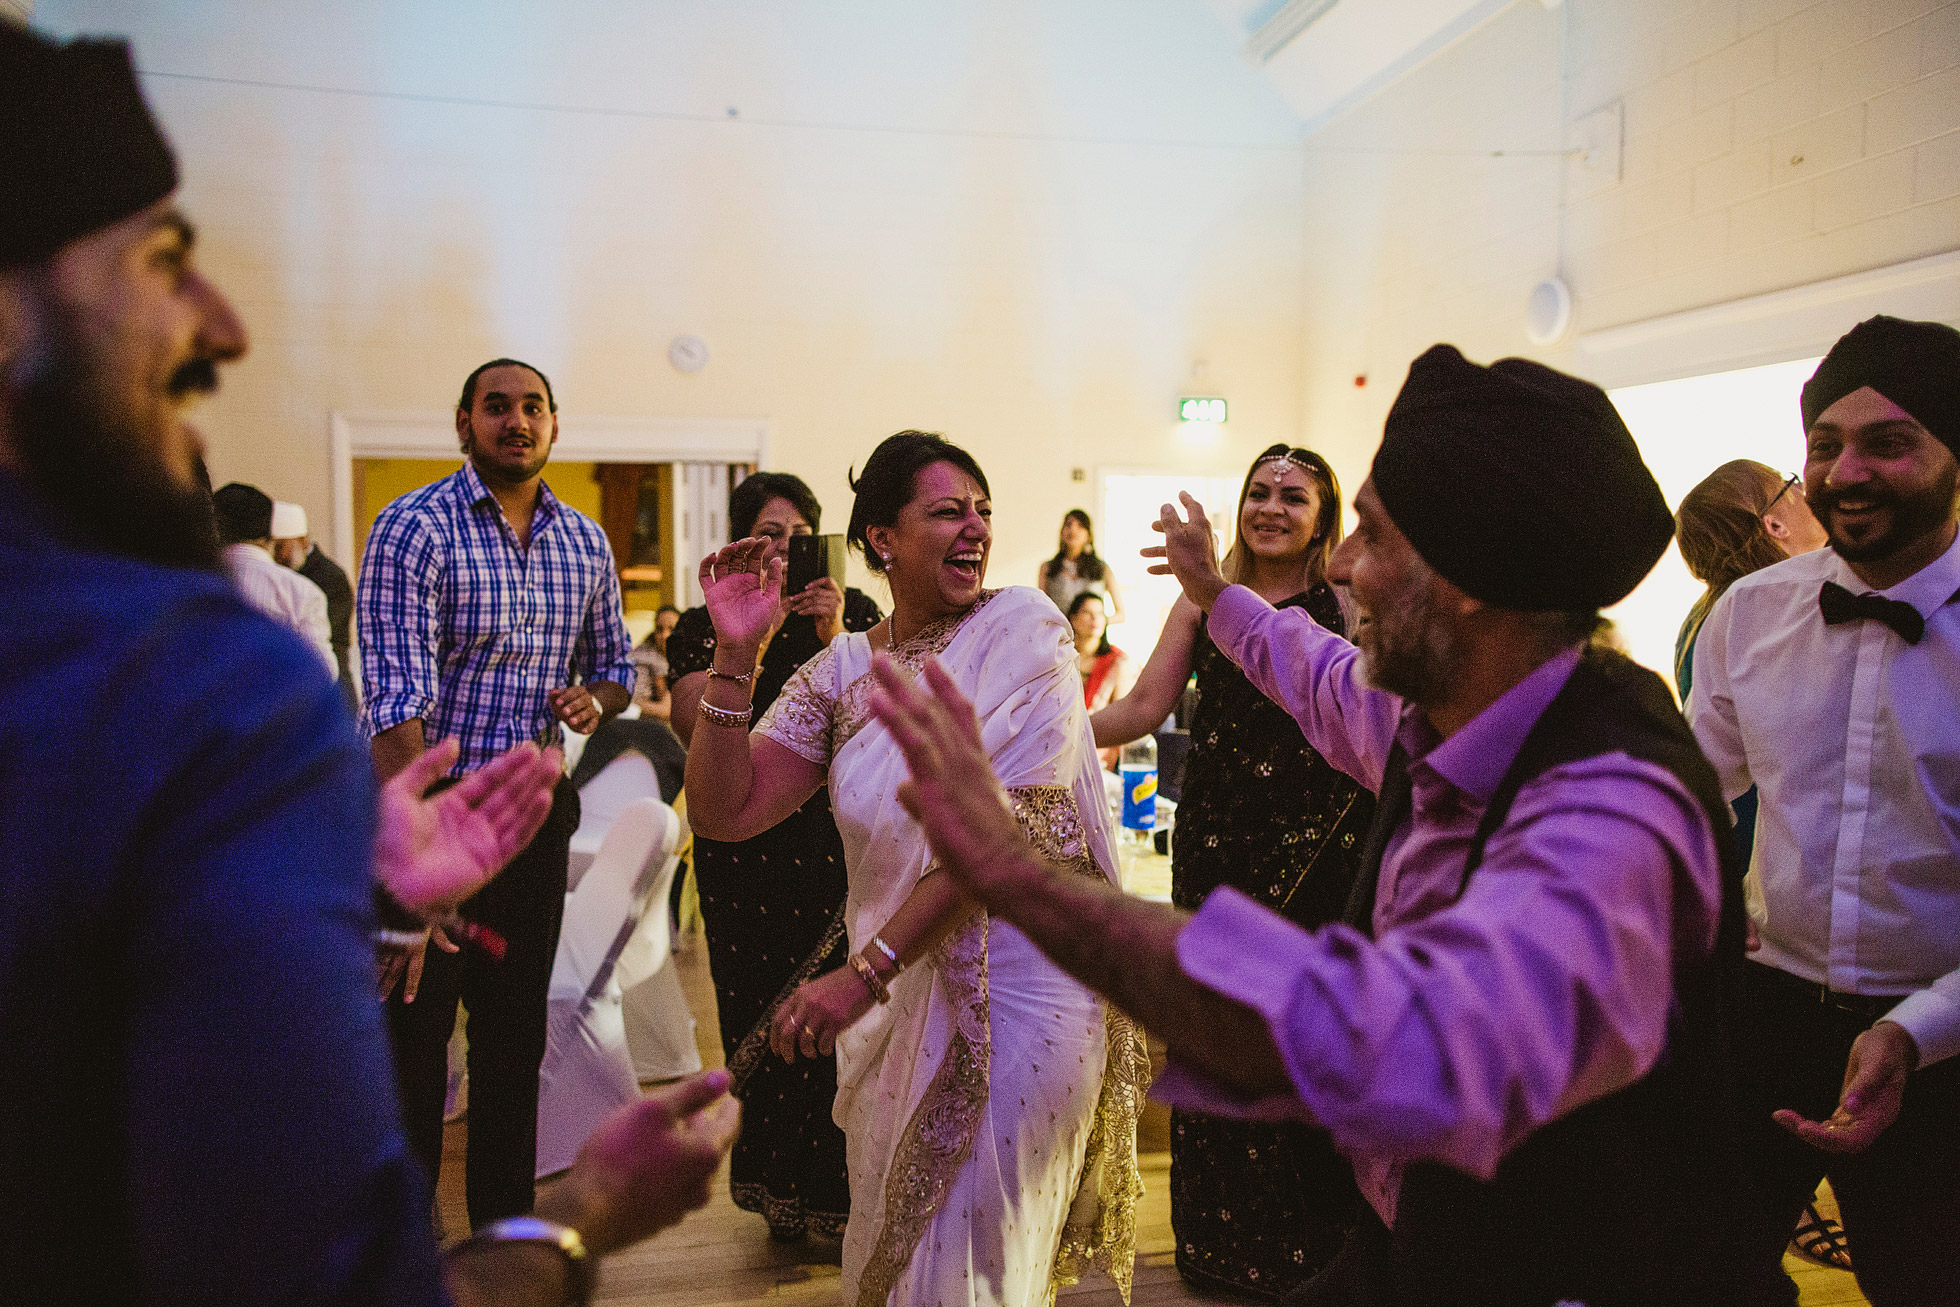 Cracoe Village Hall Weddings